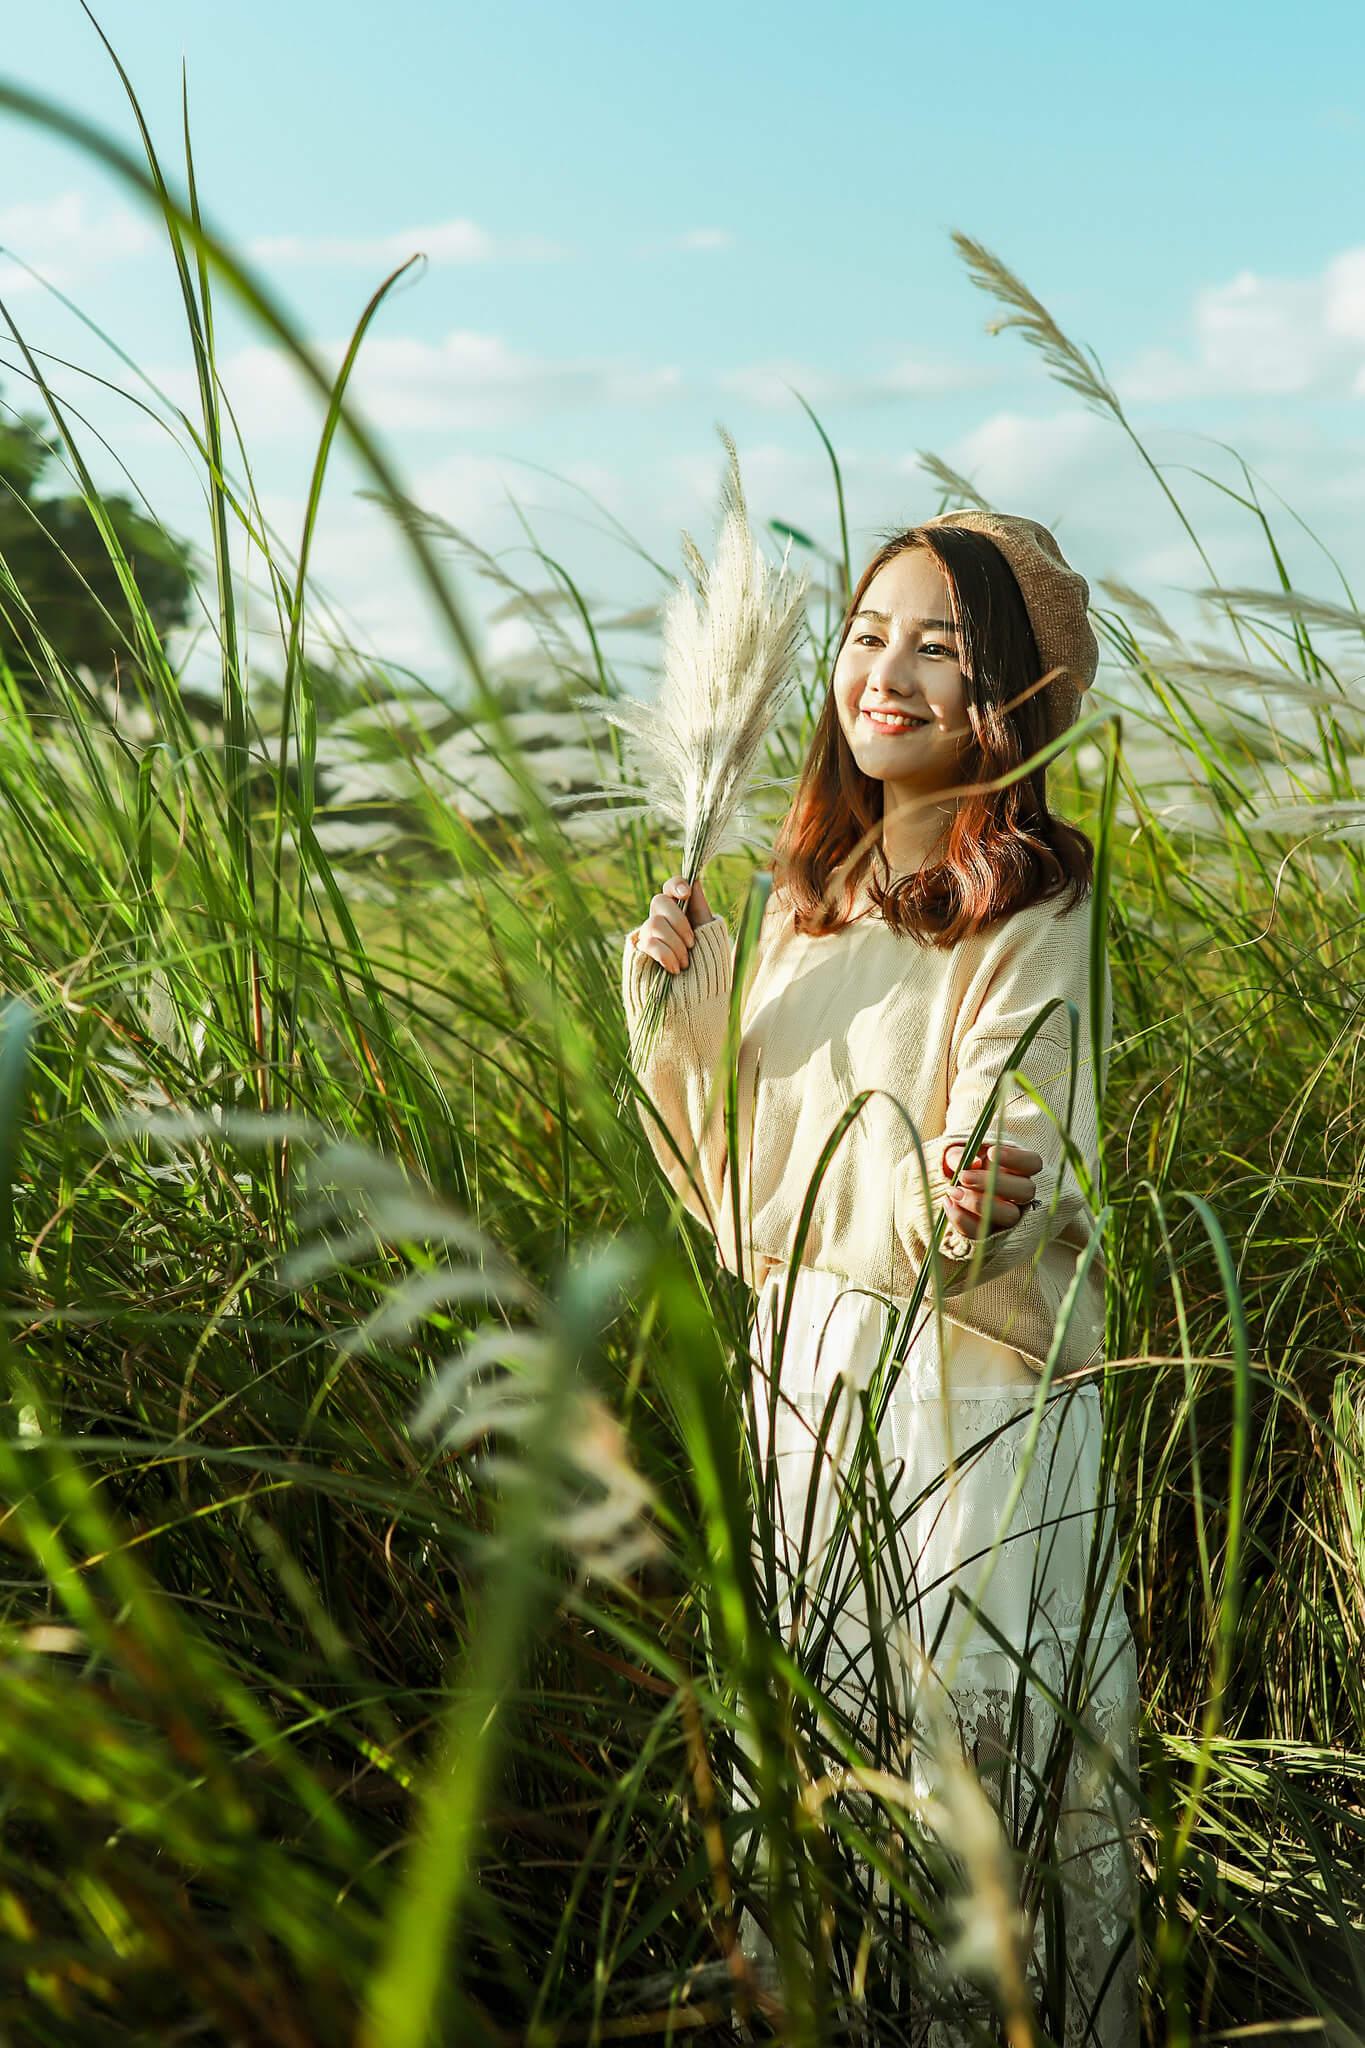 Da Nang Den Hen Lai Len Mua Co Lau Den Roi Danang Fantasticity Com 09